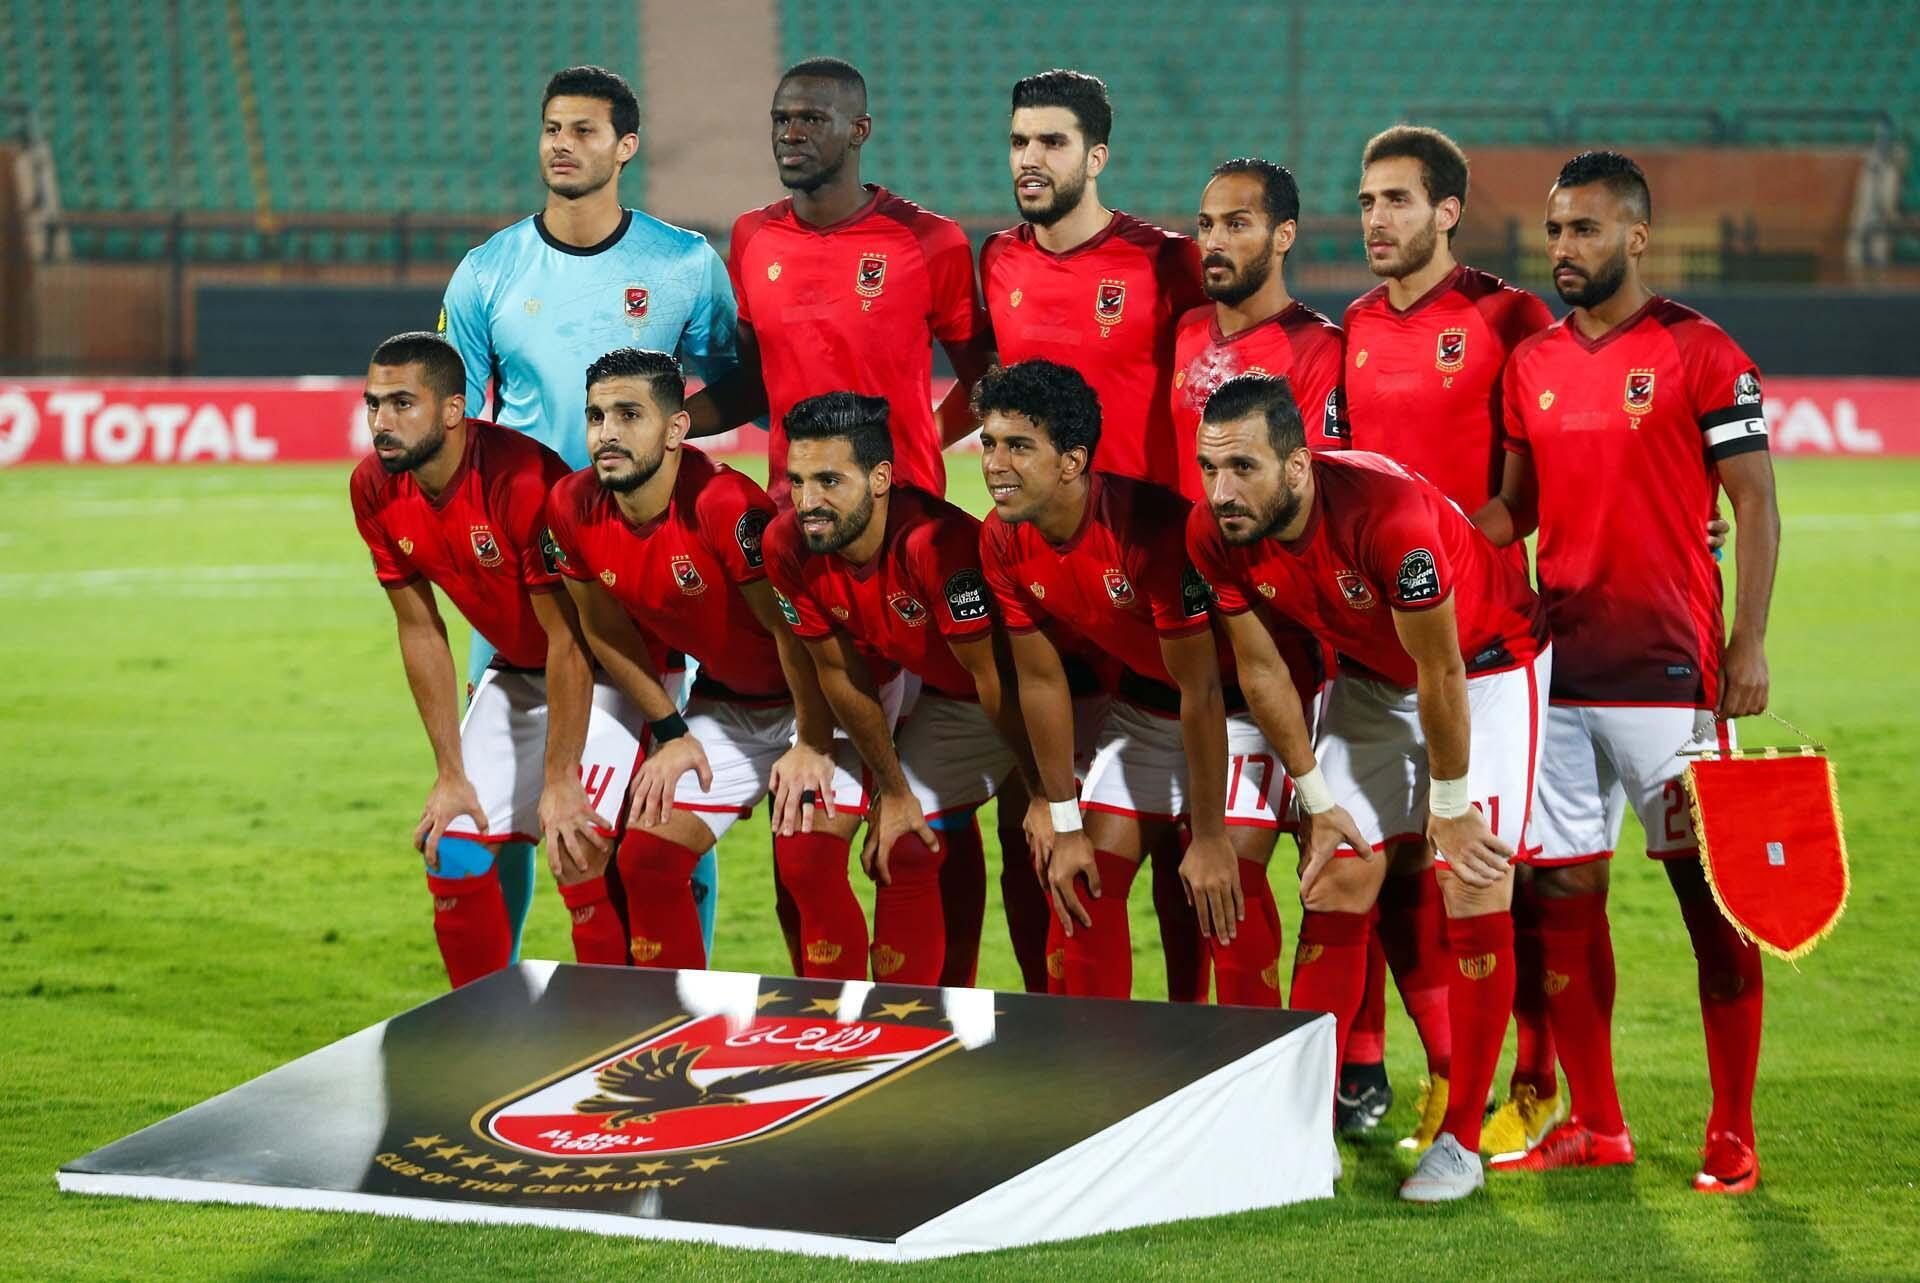 Les joueurs d'Al Ahly avant la demi-finale de la Ligue des Champions de la CAF contre l'ES de Sétif, le 2 octobre 2018.